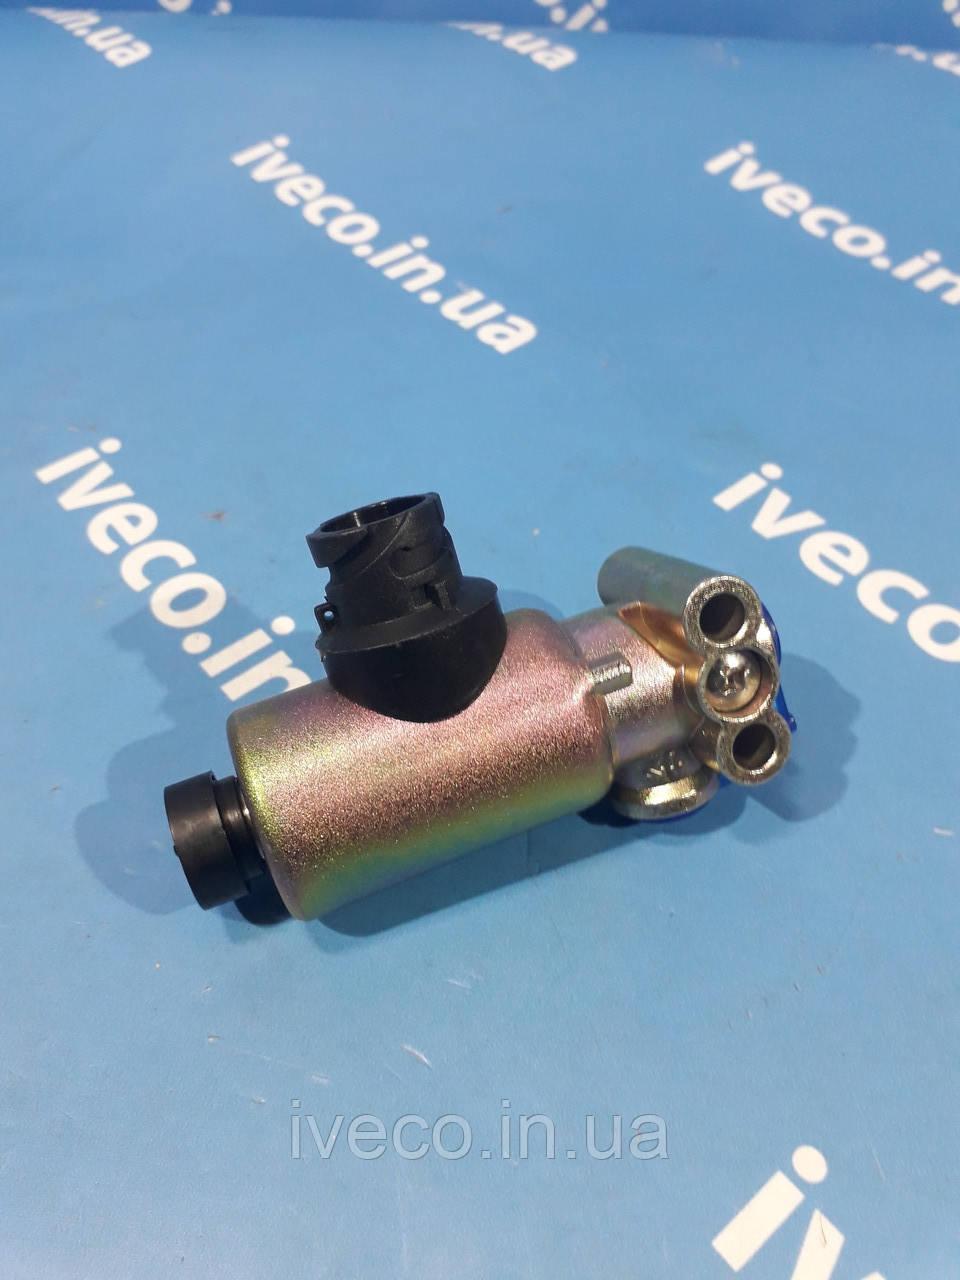 Клапан электромагнитный соленоид IVECO RVI NEOPLAN SCANIA DAF 95XF 41025616 4721706060 1527021 11526CNT